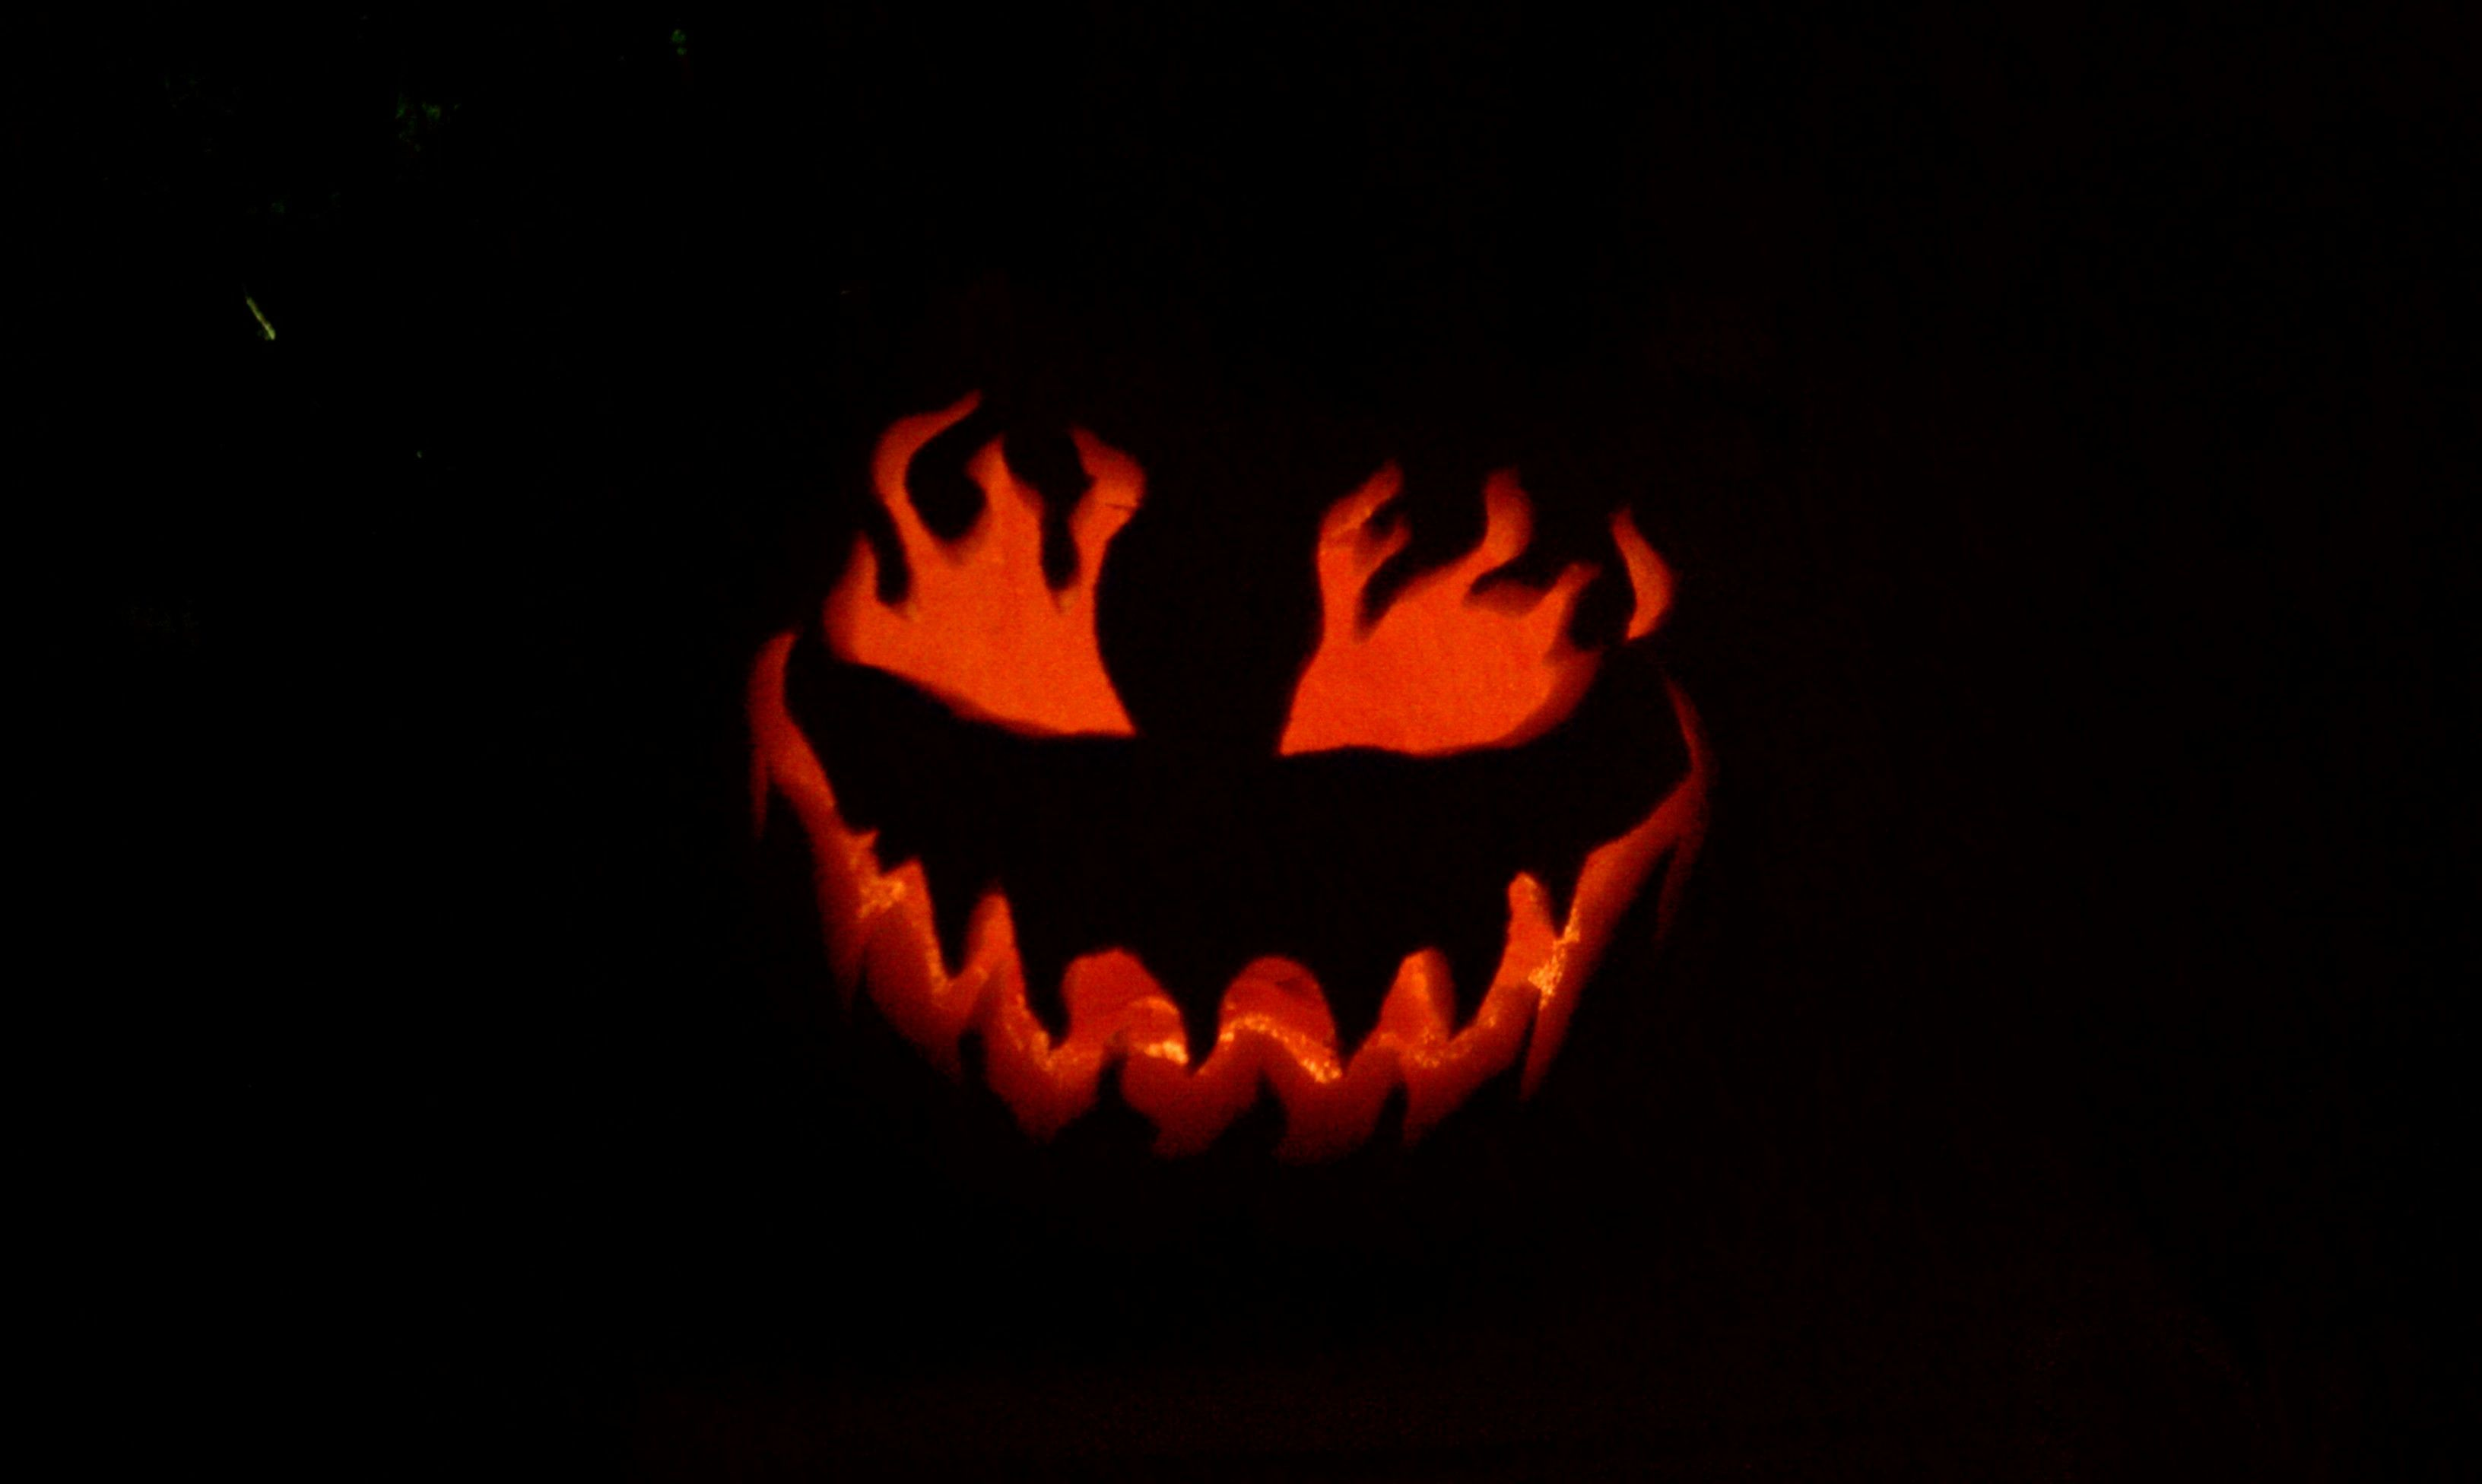 Scary face lit up pumpkin carving halloween pinterest